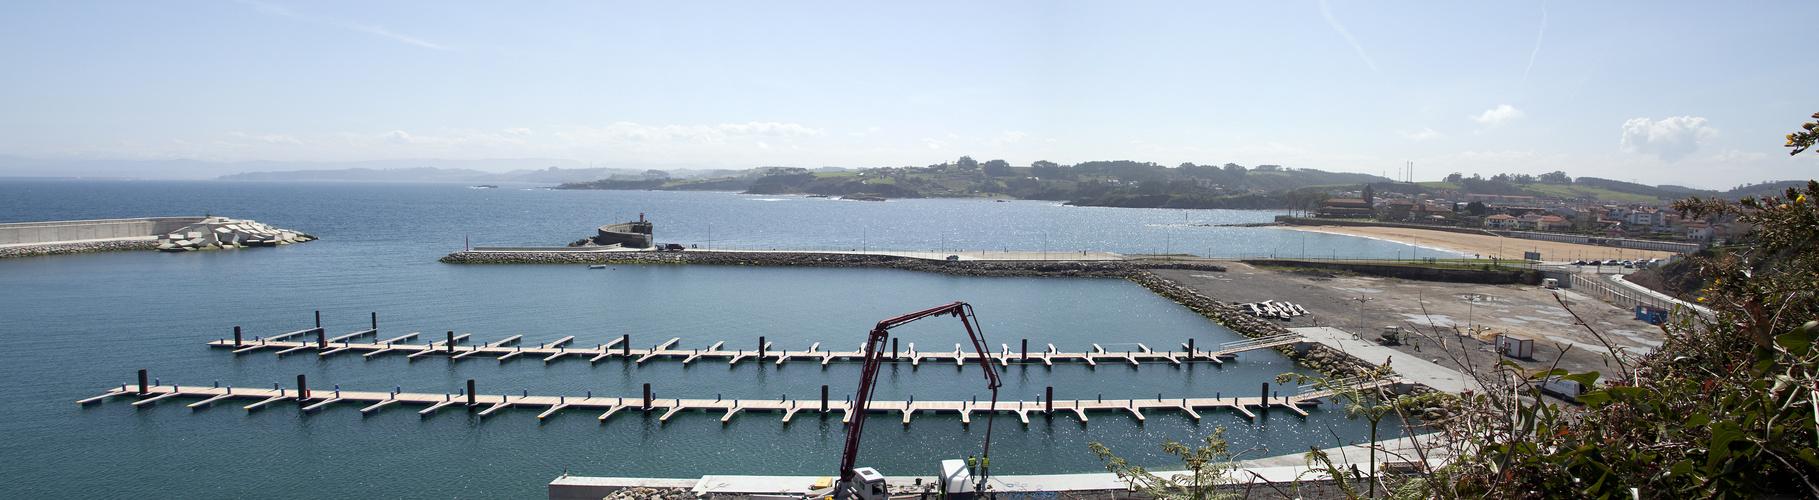 puerto deportivo luanco